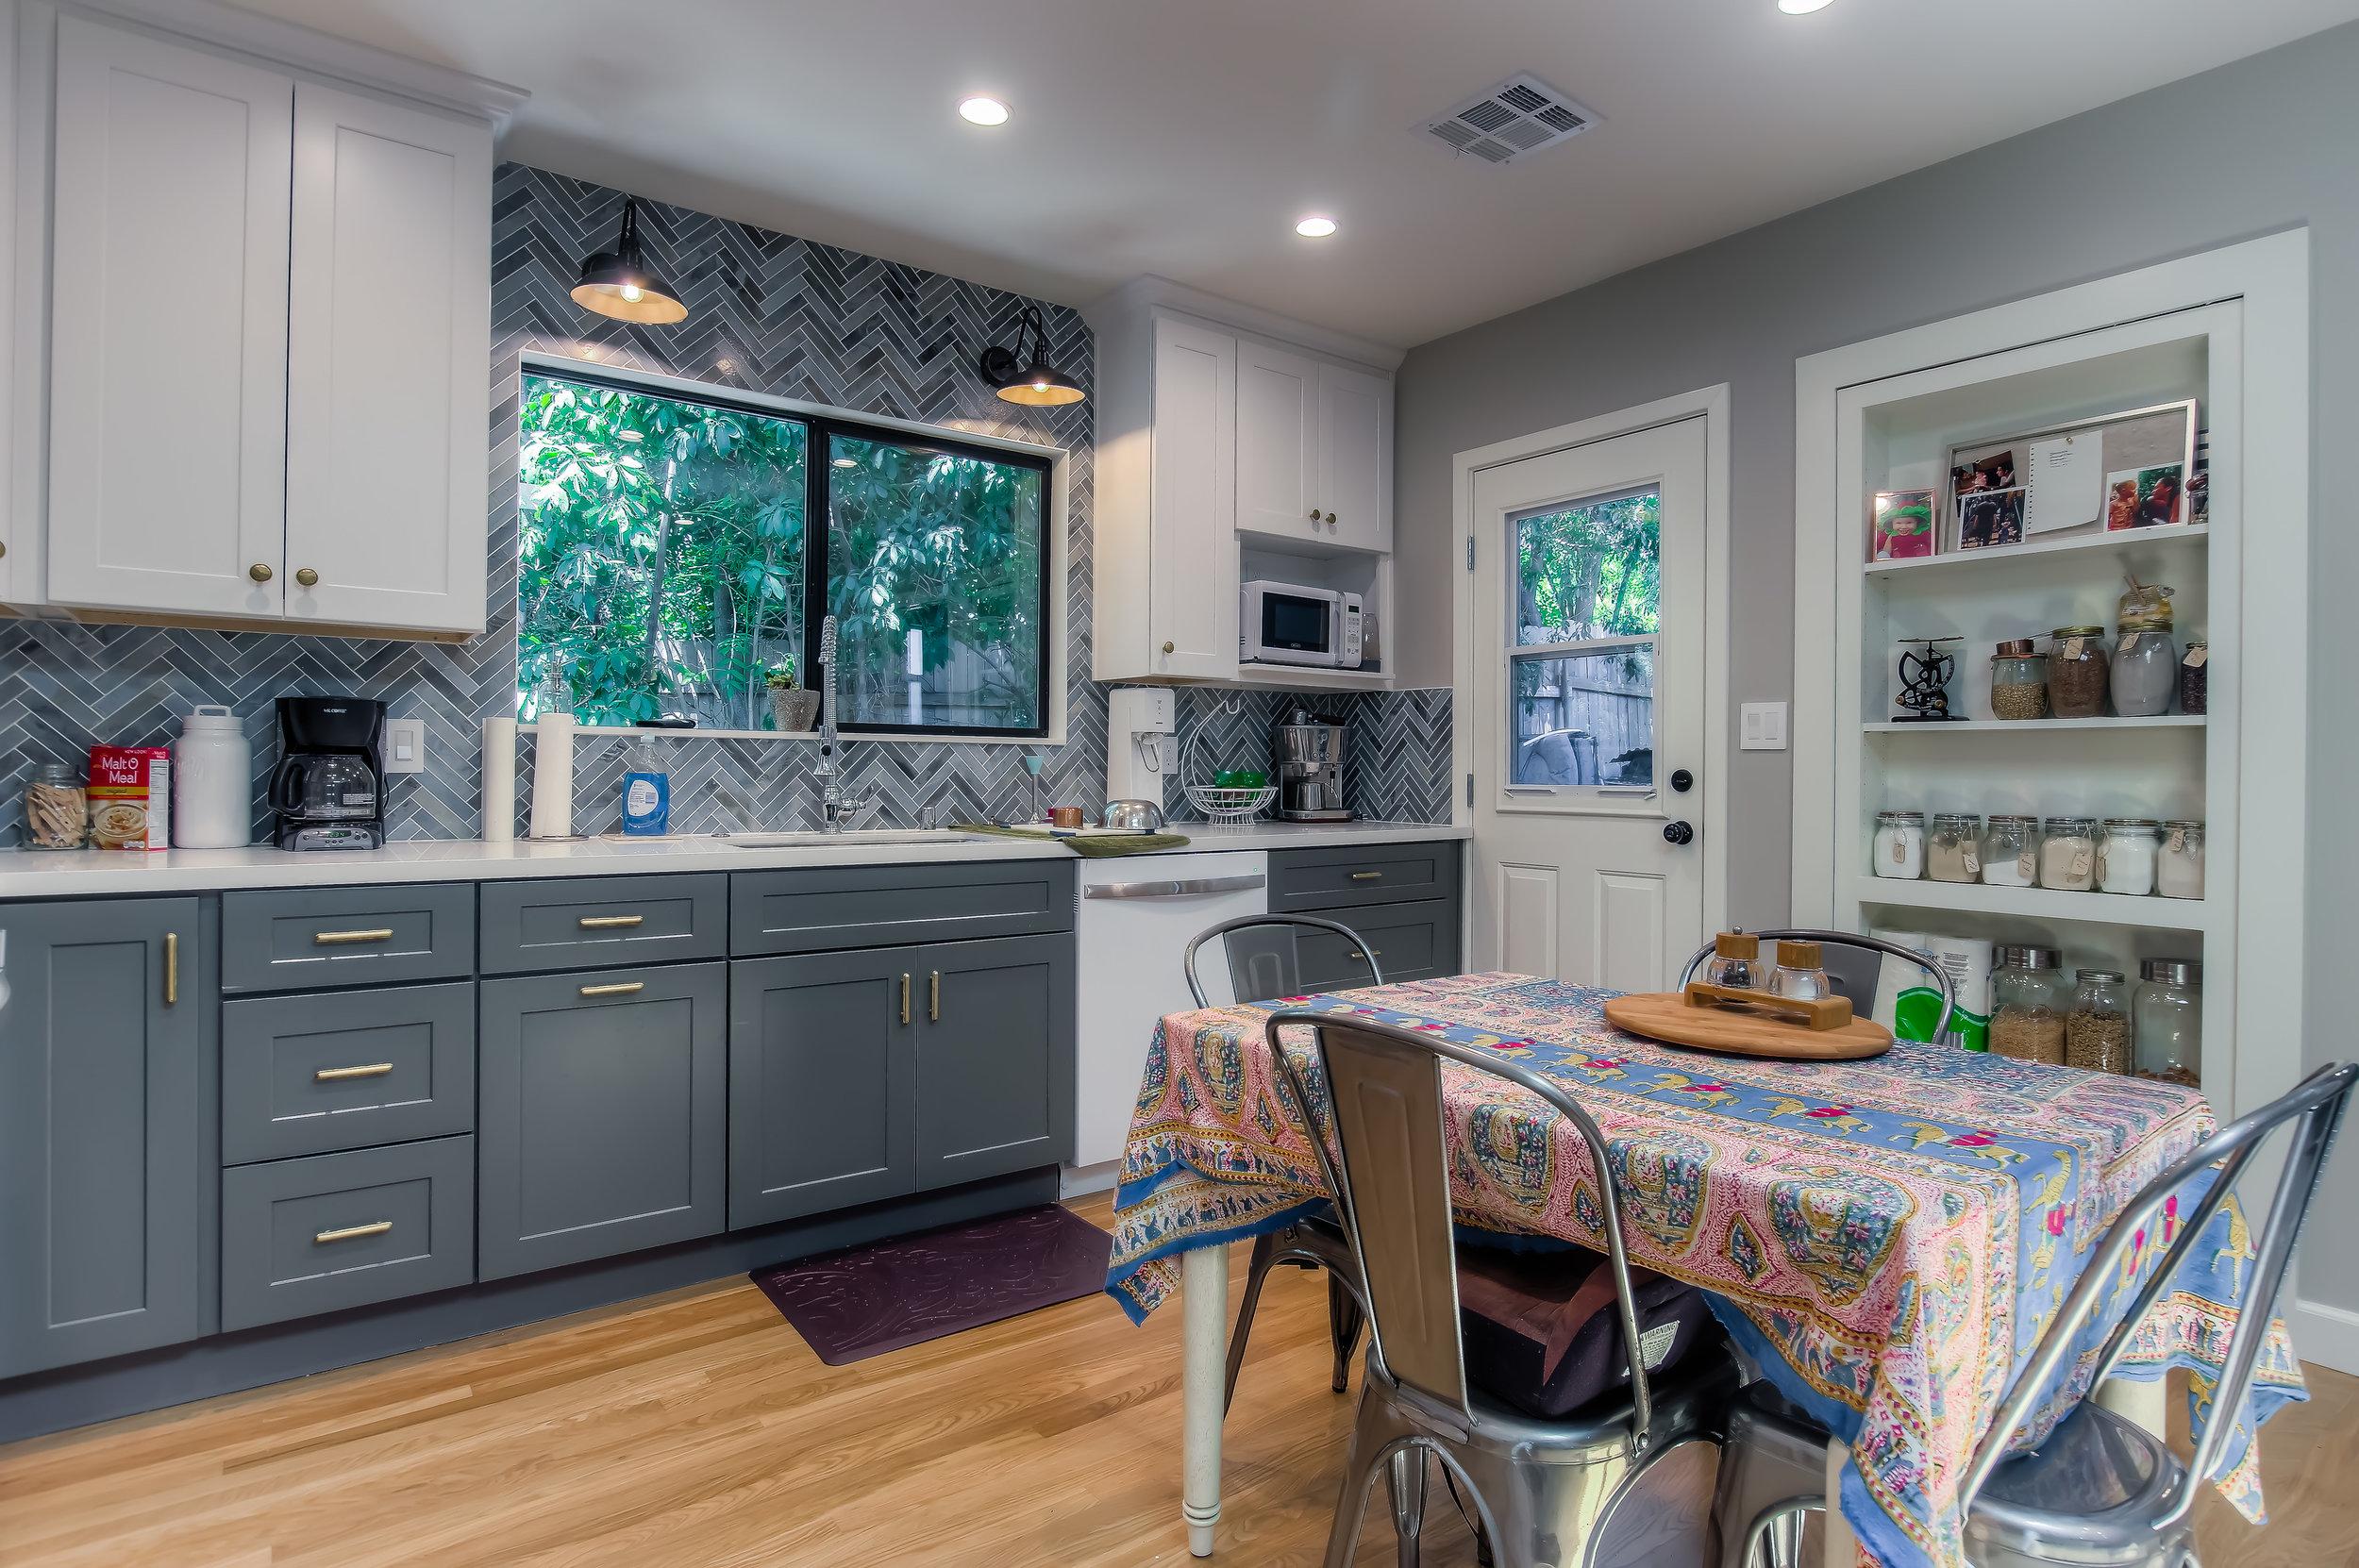 altadena_Cottage_kitchen_remodel.jpg